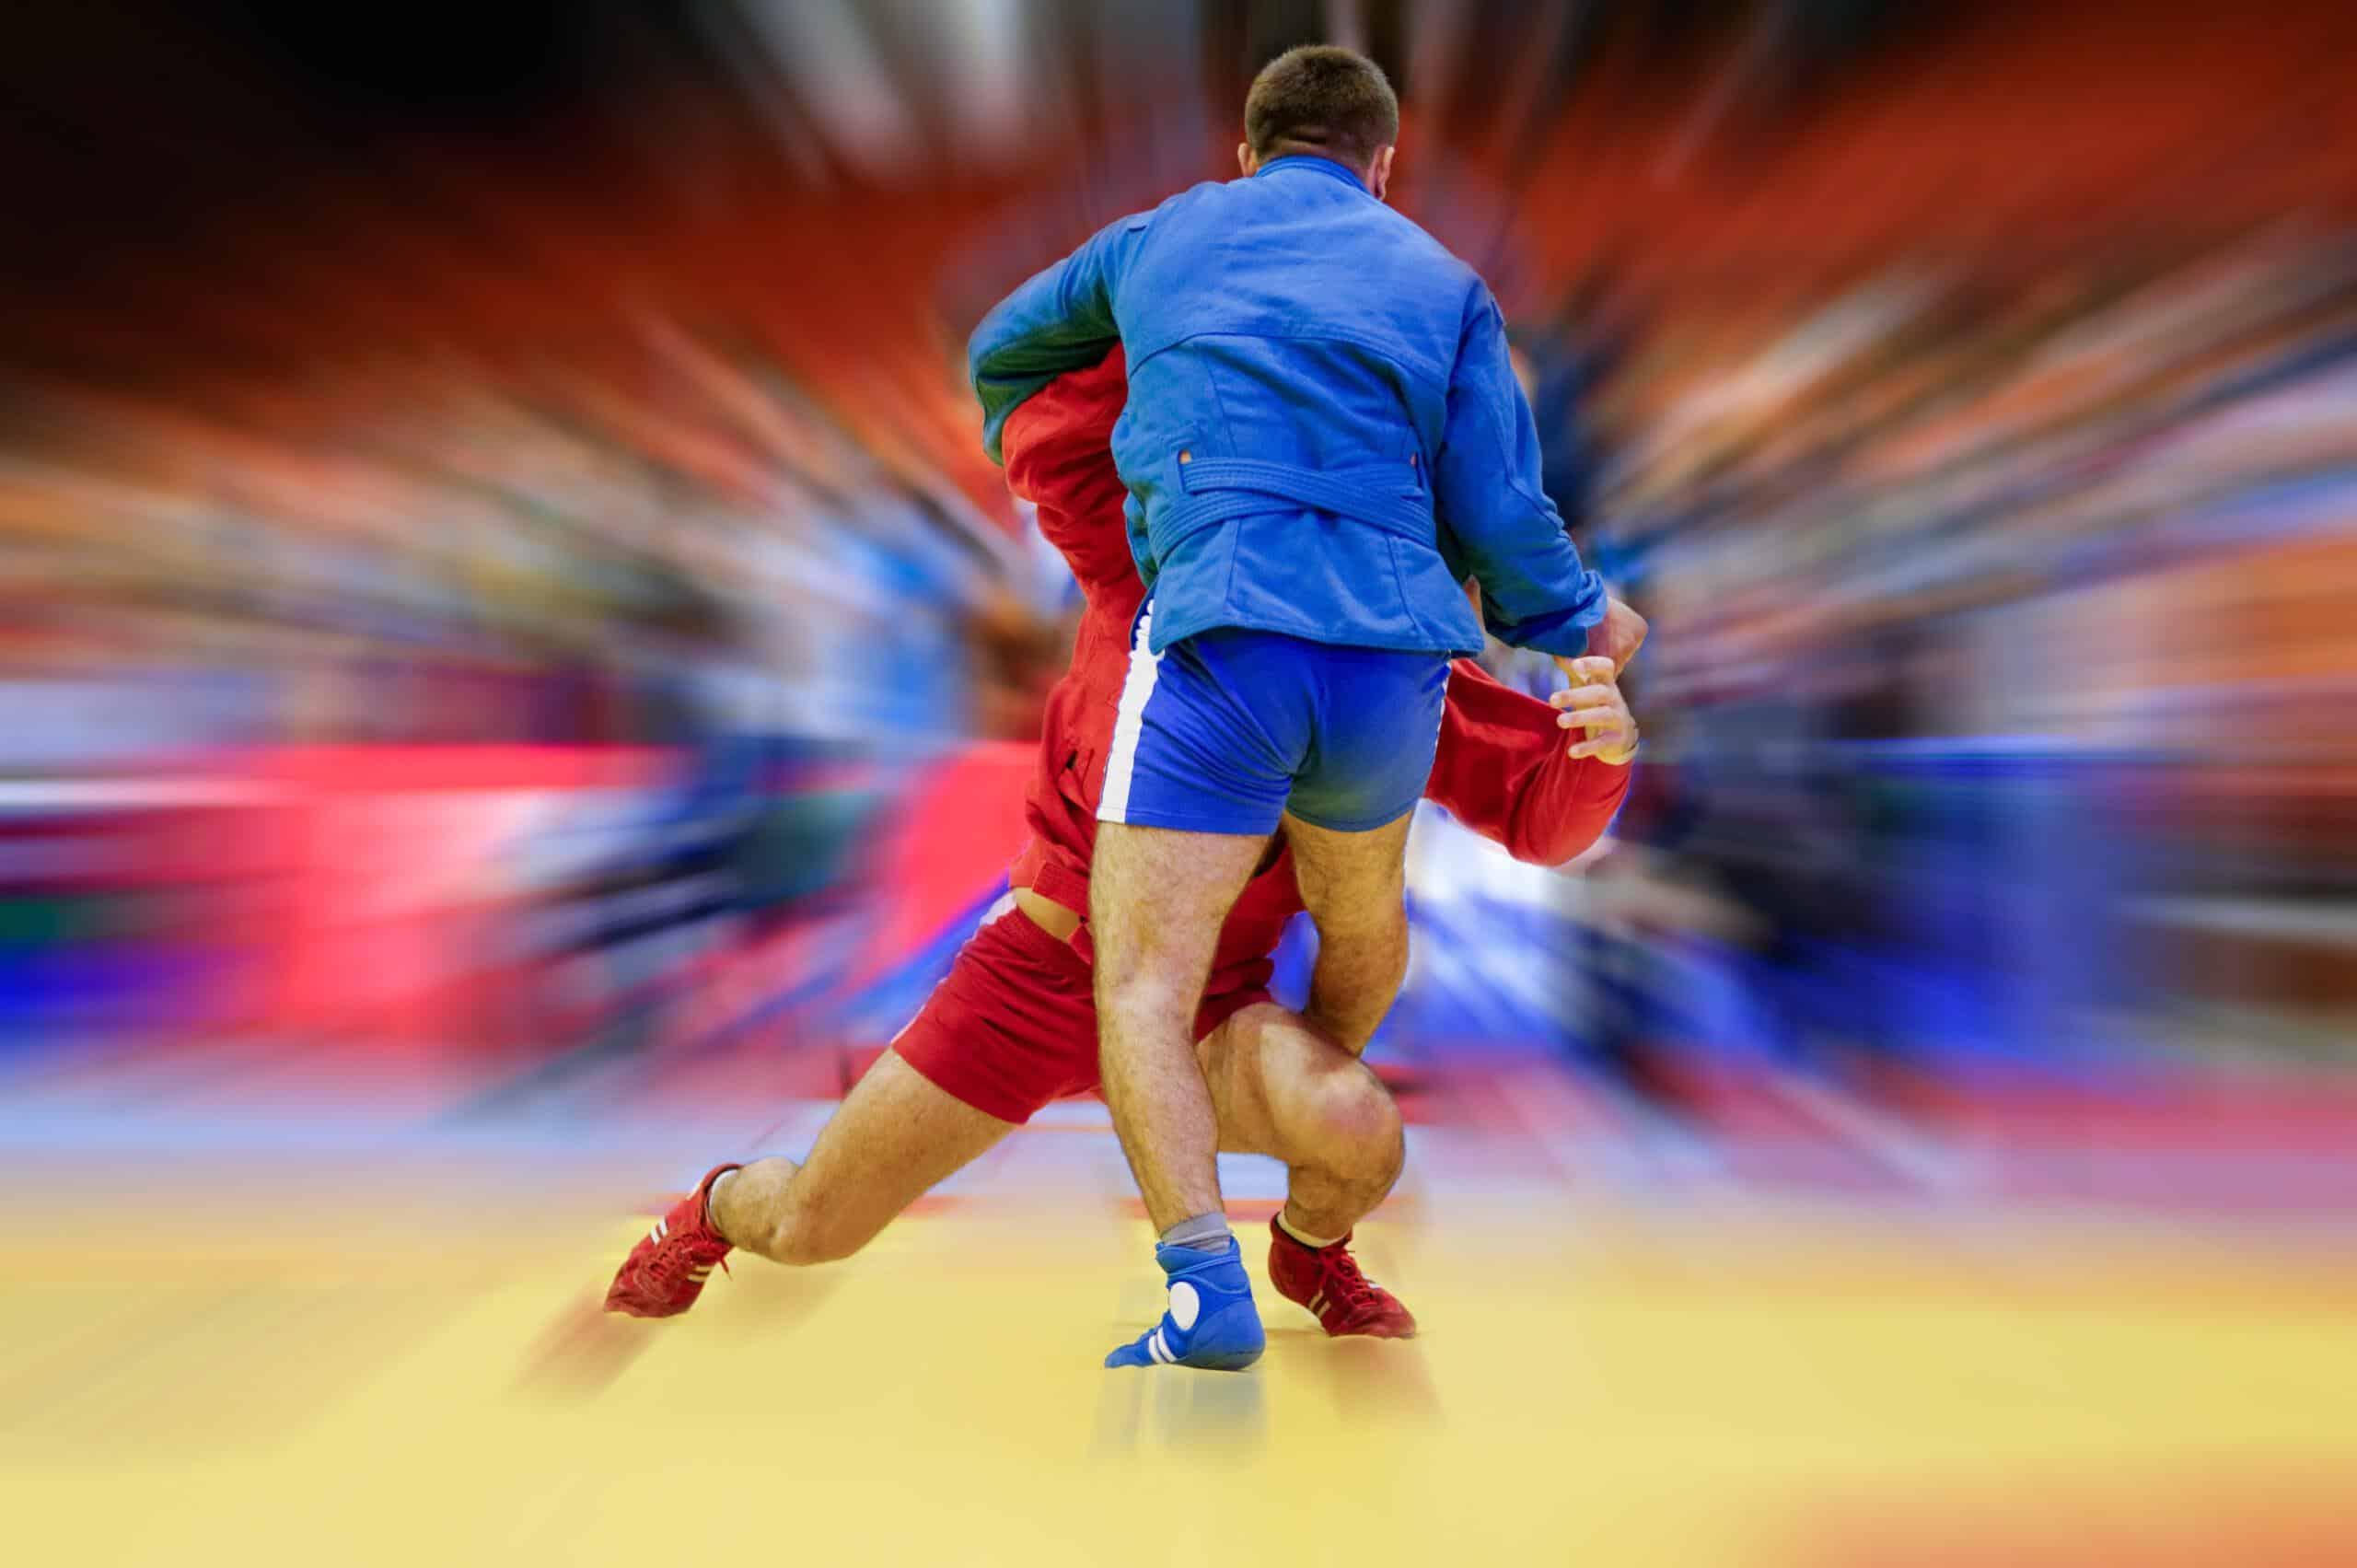 effective martial arts for self defense